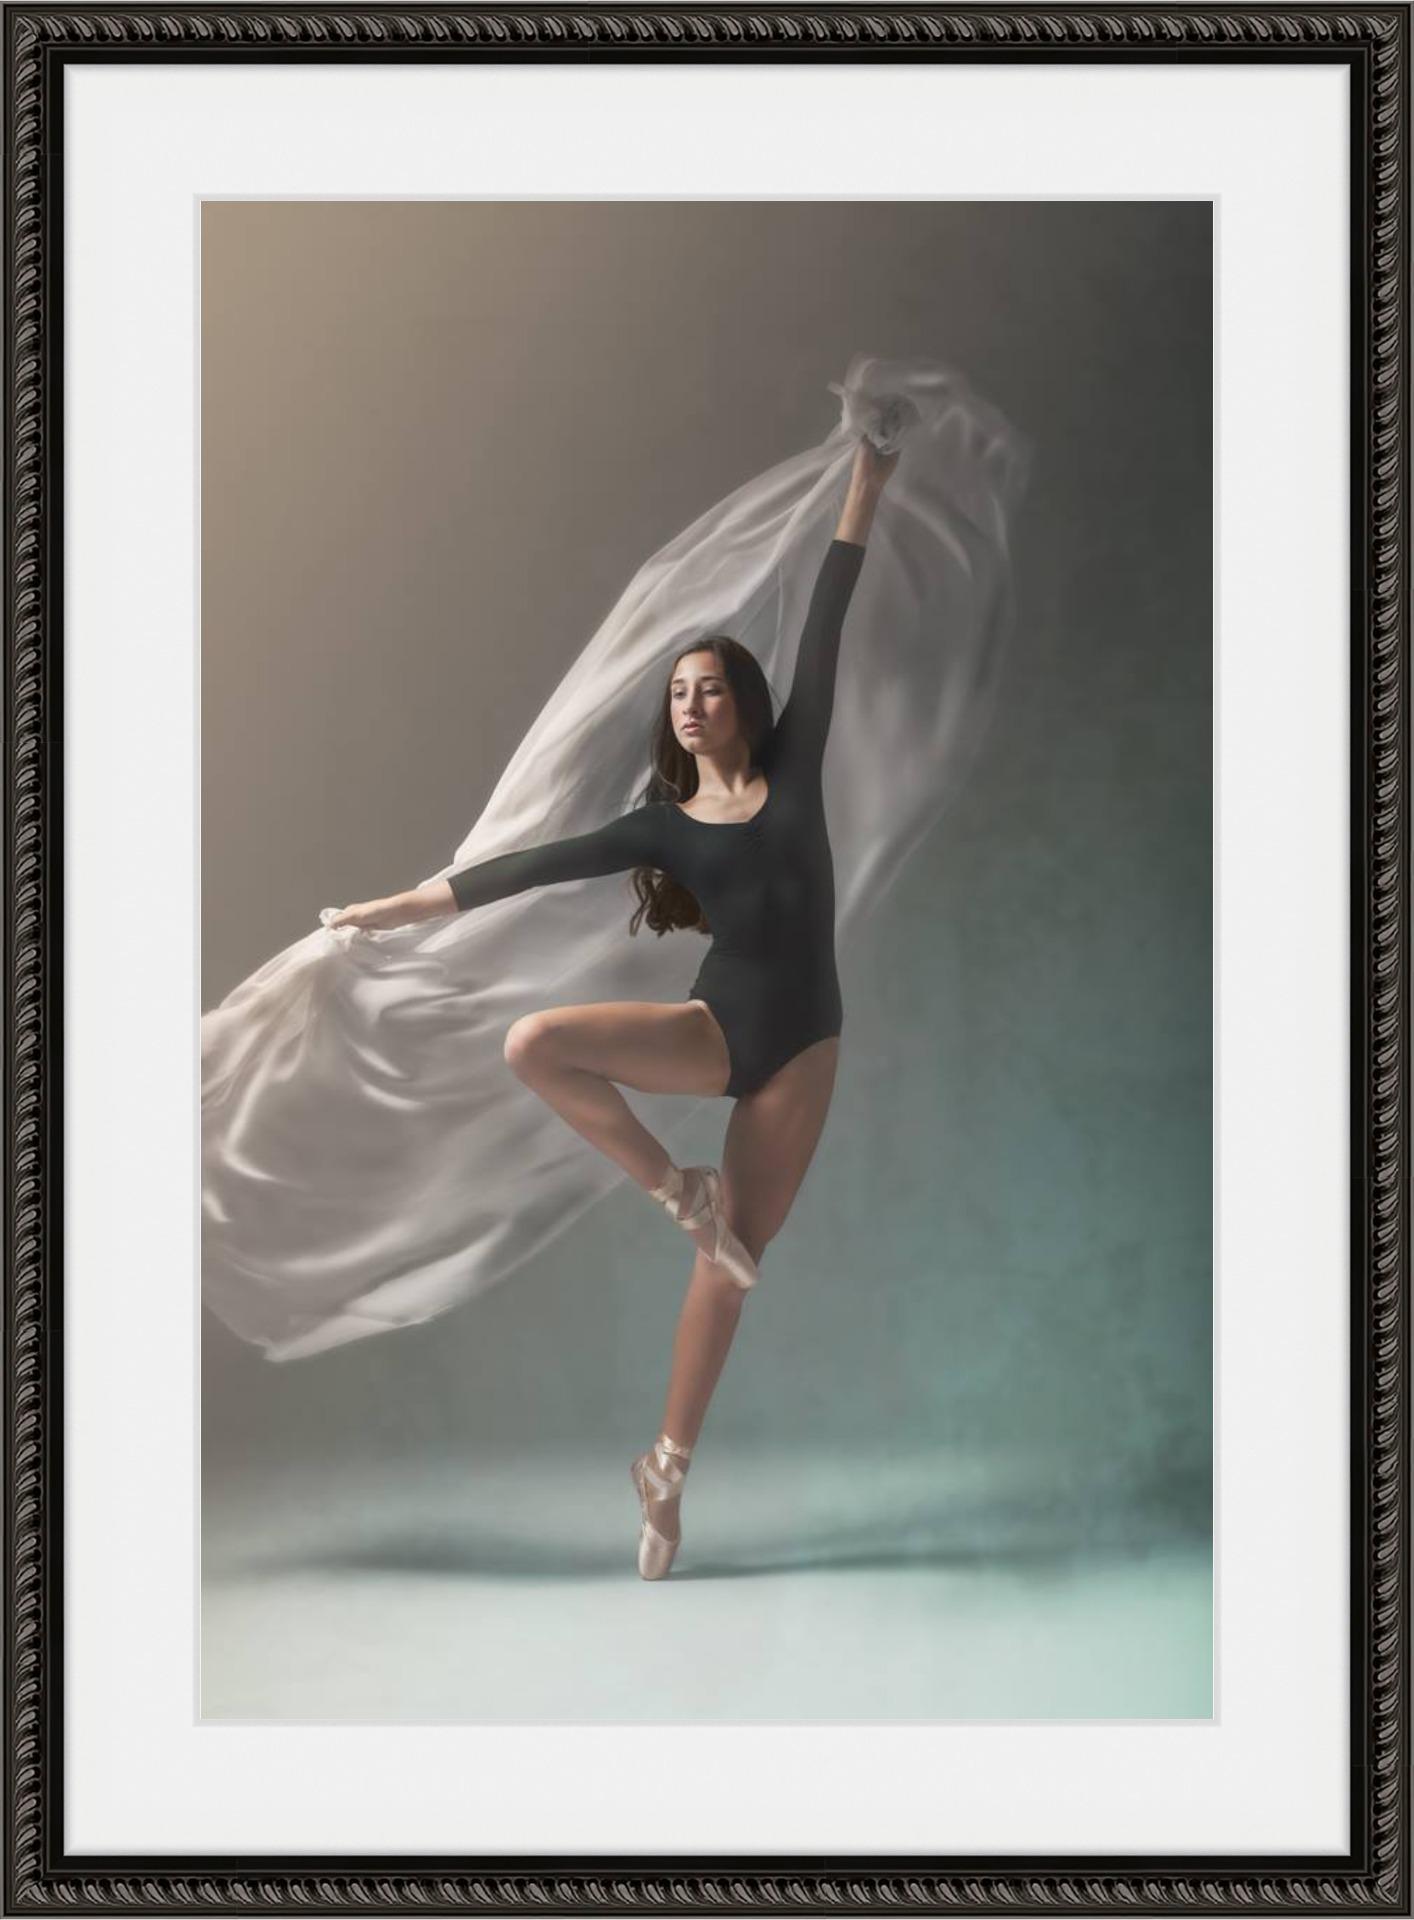 senior_portrait_photography_pittsburgh_pa_jennifer_dworek.jpg